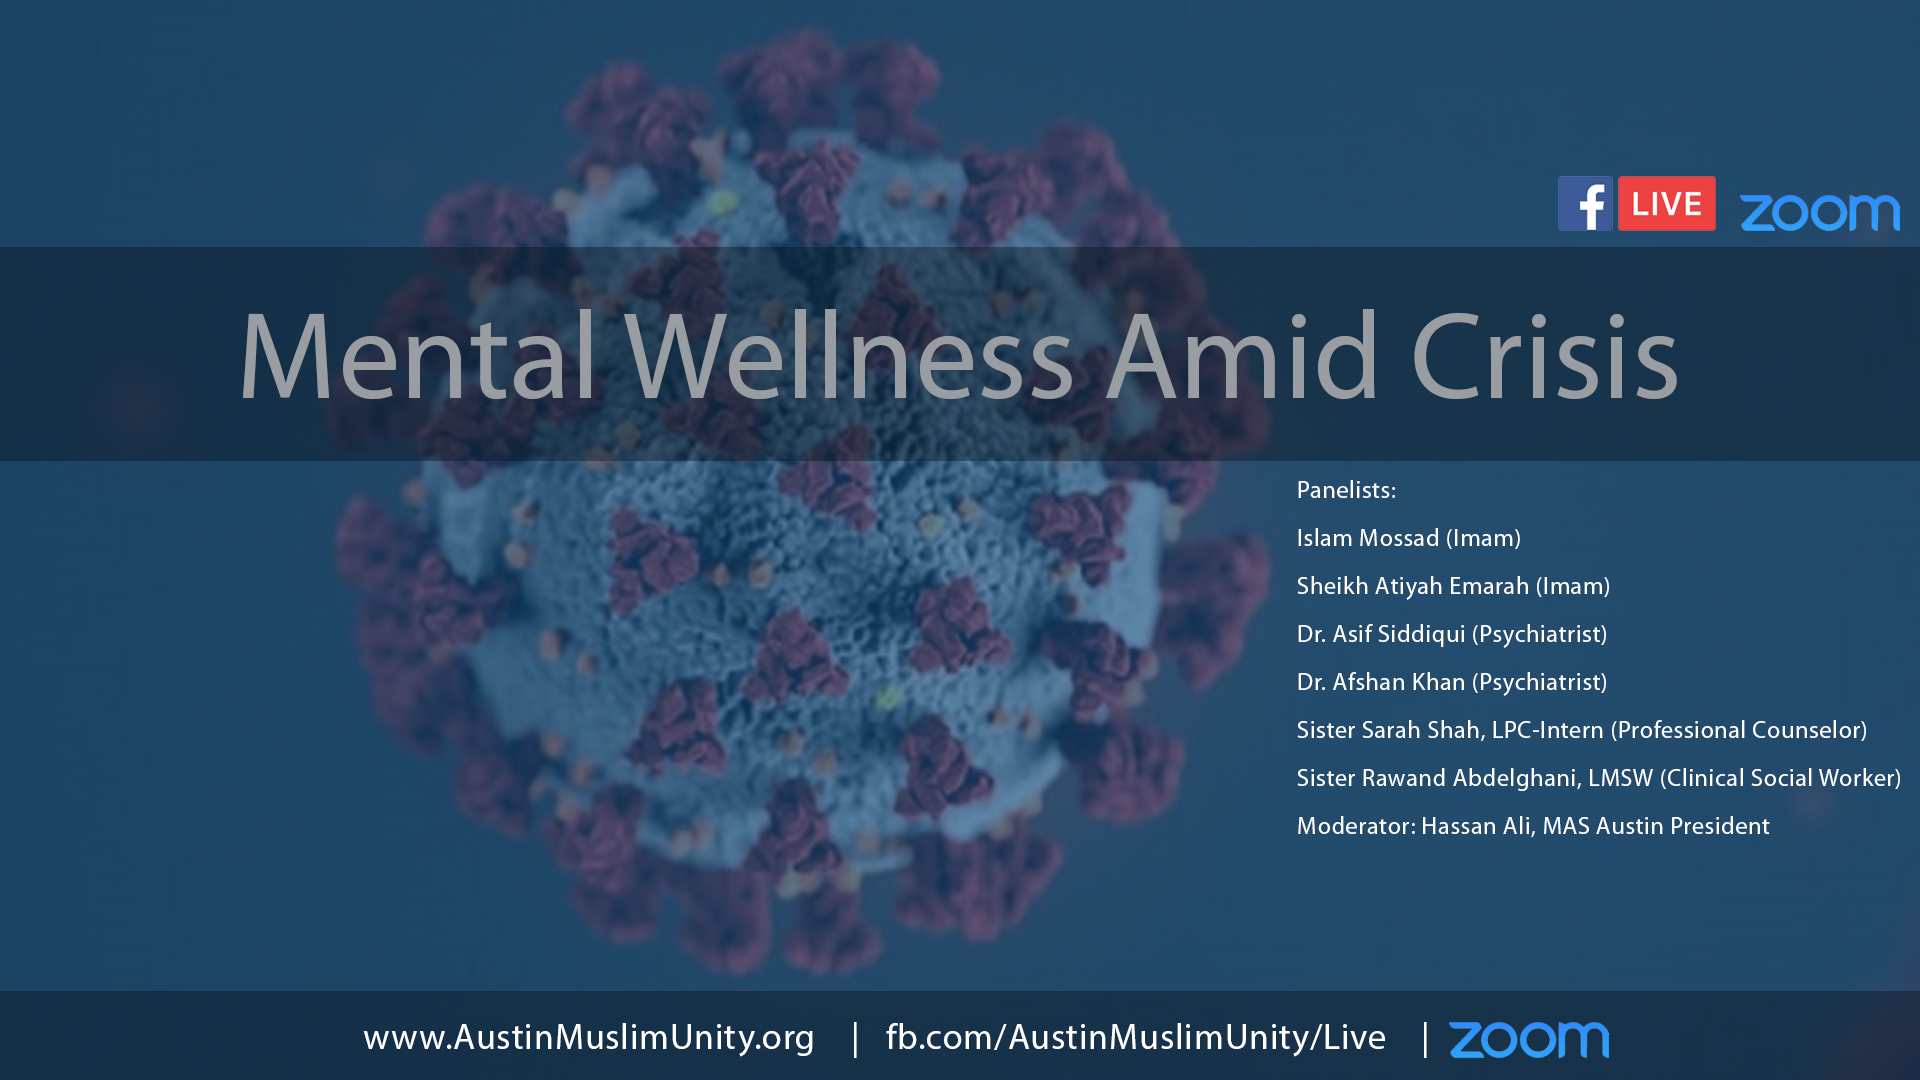 Mental Wellness Amid Crisis